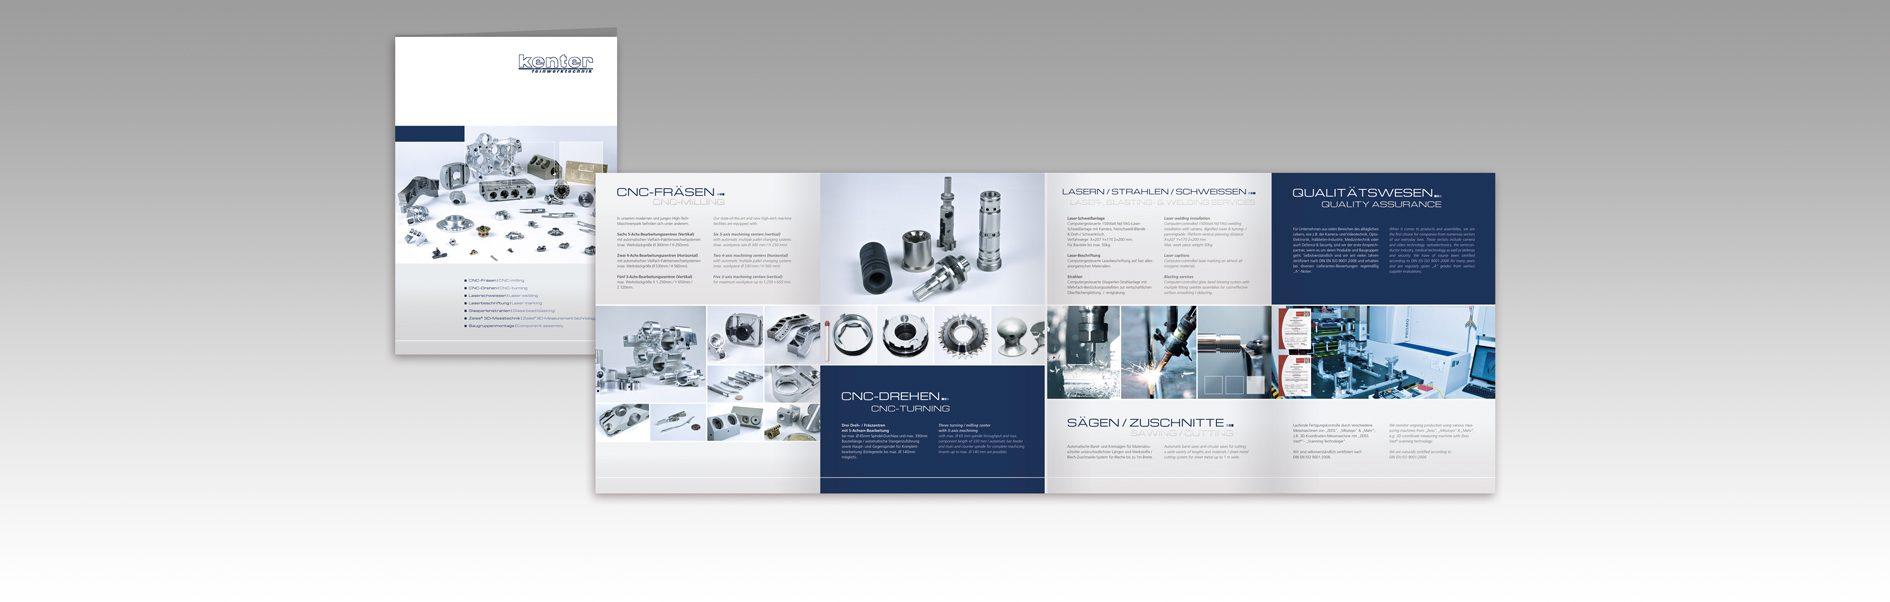 Hier ist das Kenter Anlagentechnik Firmenprofil abgebildet.